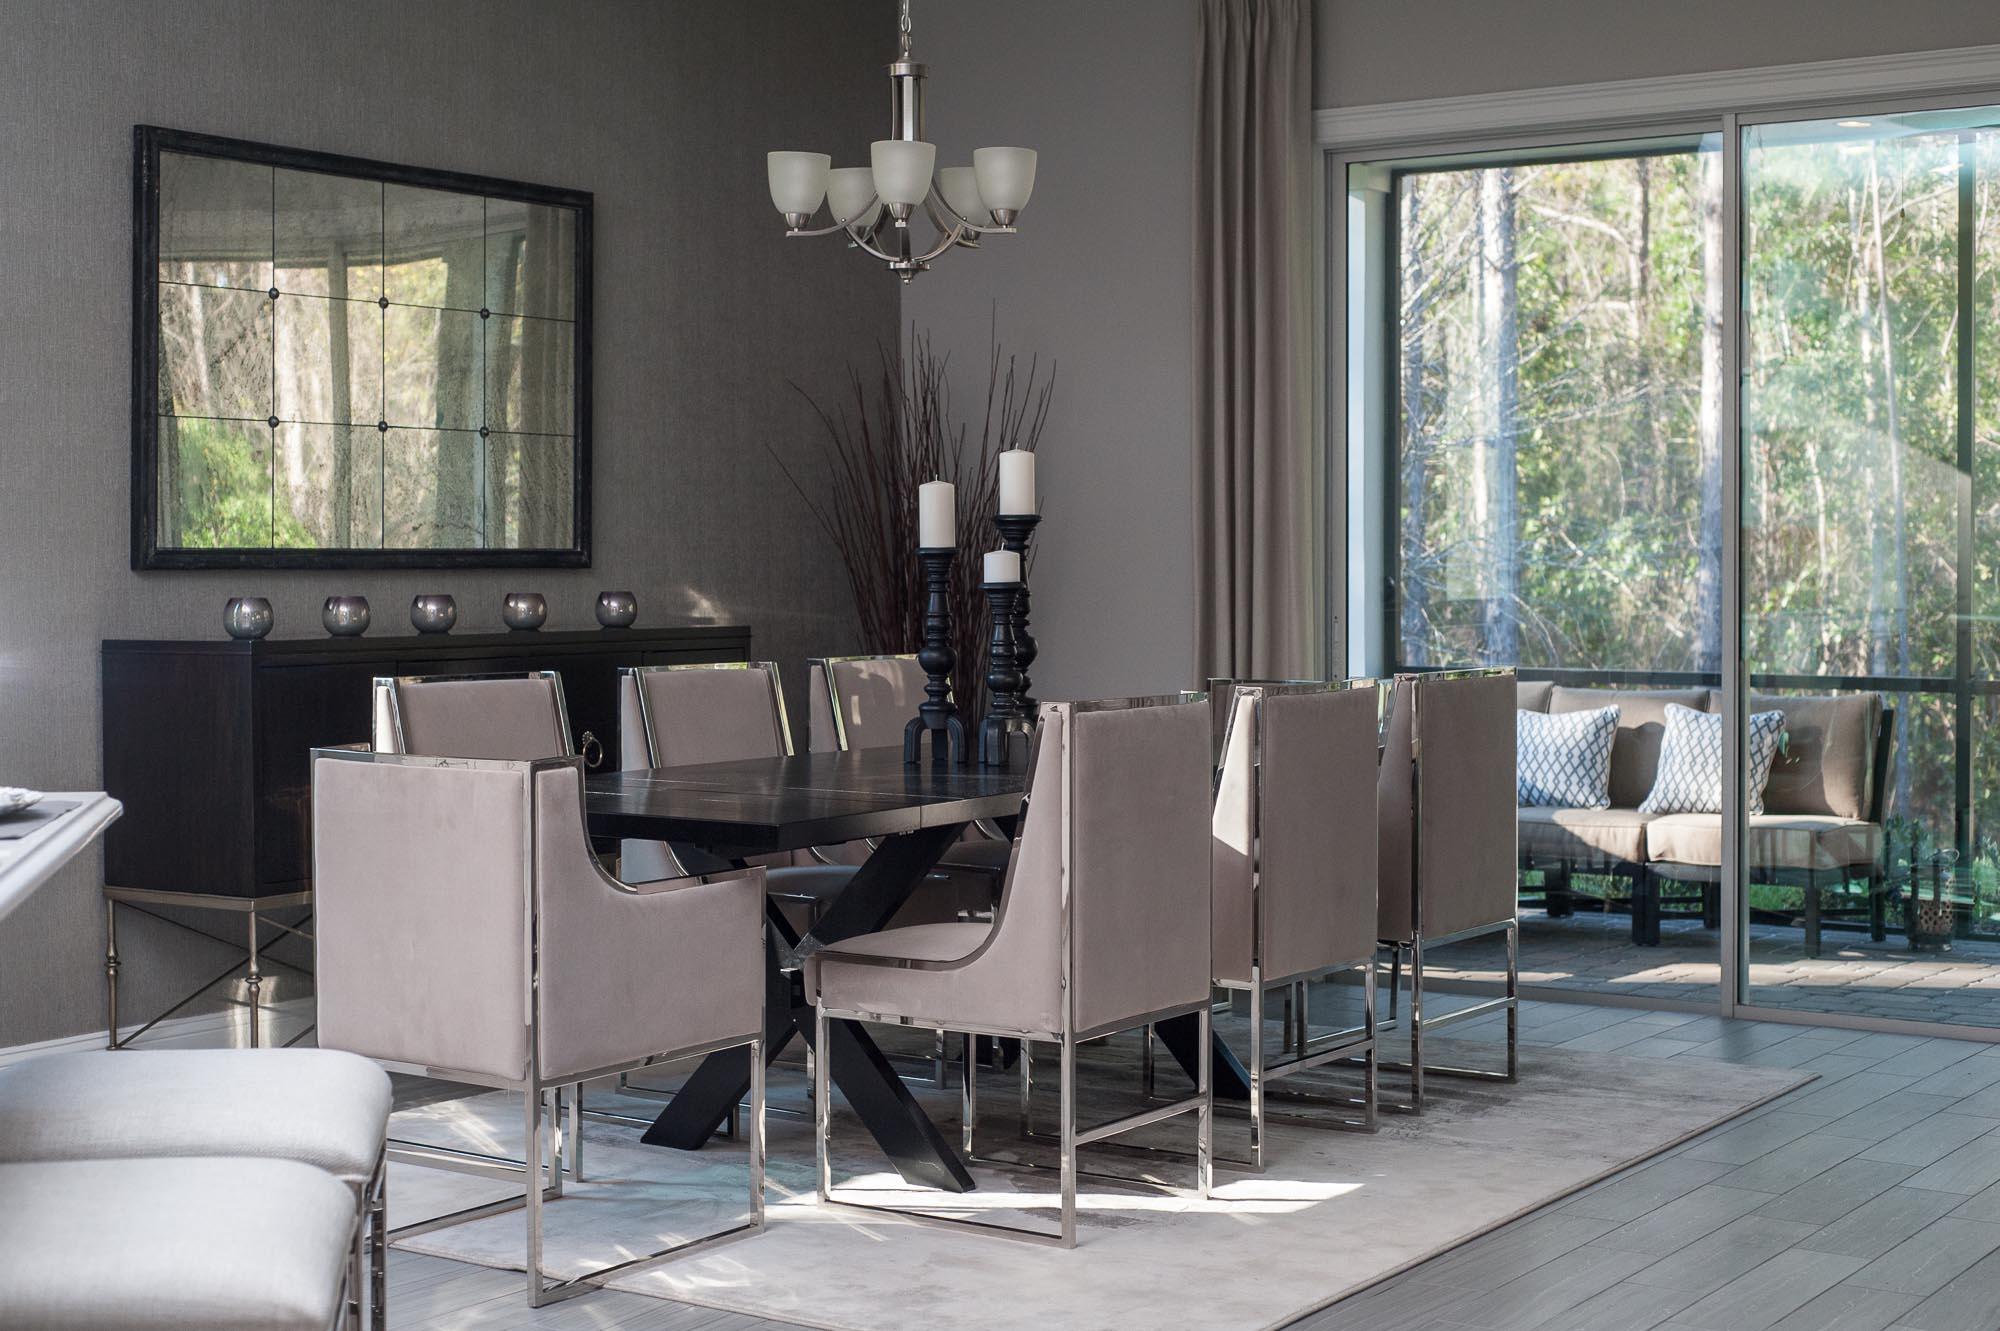 dayton-dr-horton-dr horton-st johns-jacksonville-florida-nefba-northeast florida-southeastern united states-residential interior design-transitional-dining-room-dining room-buffet.jpg